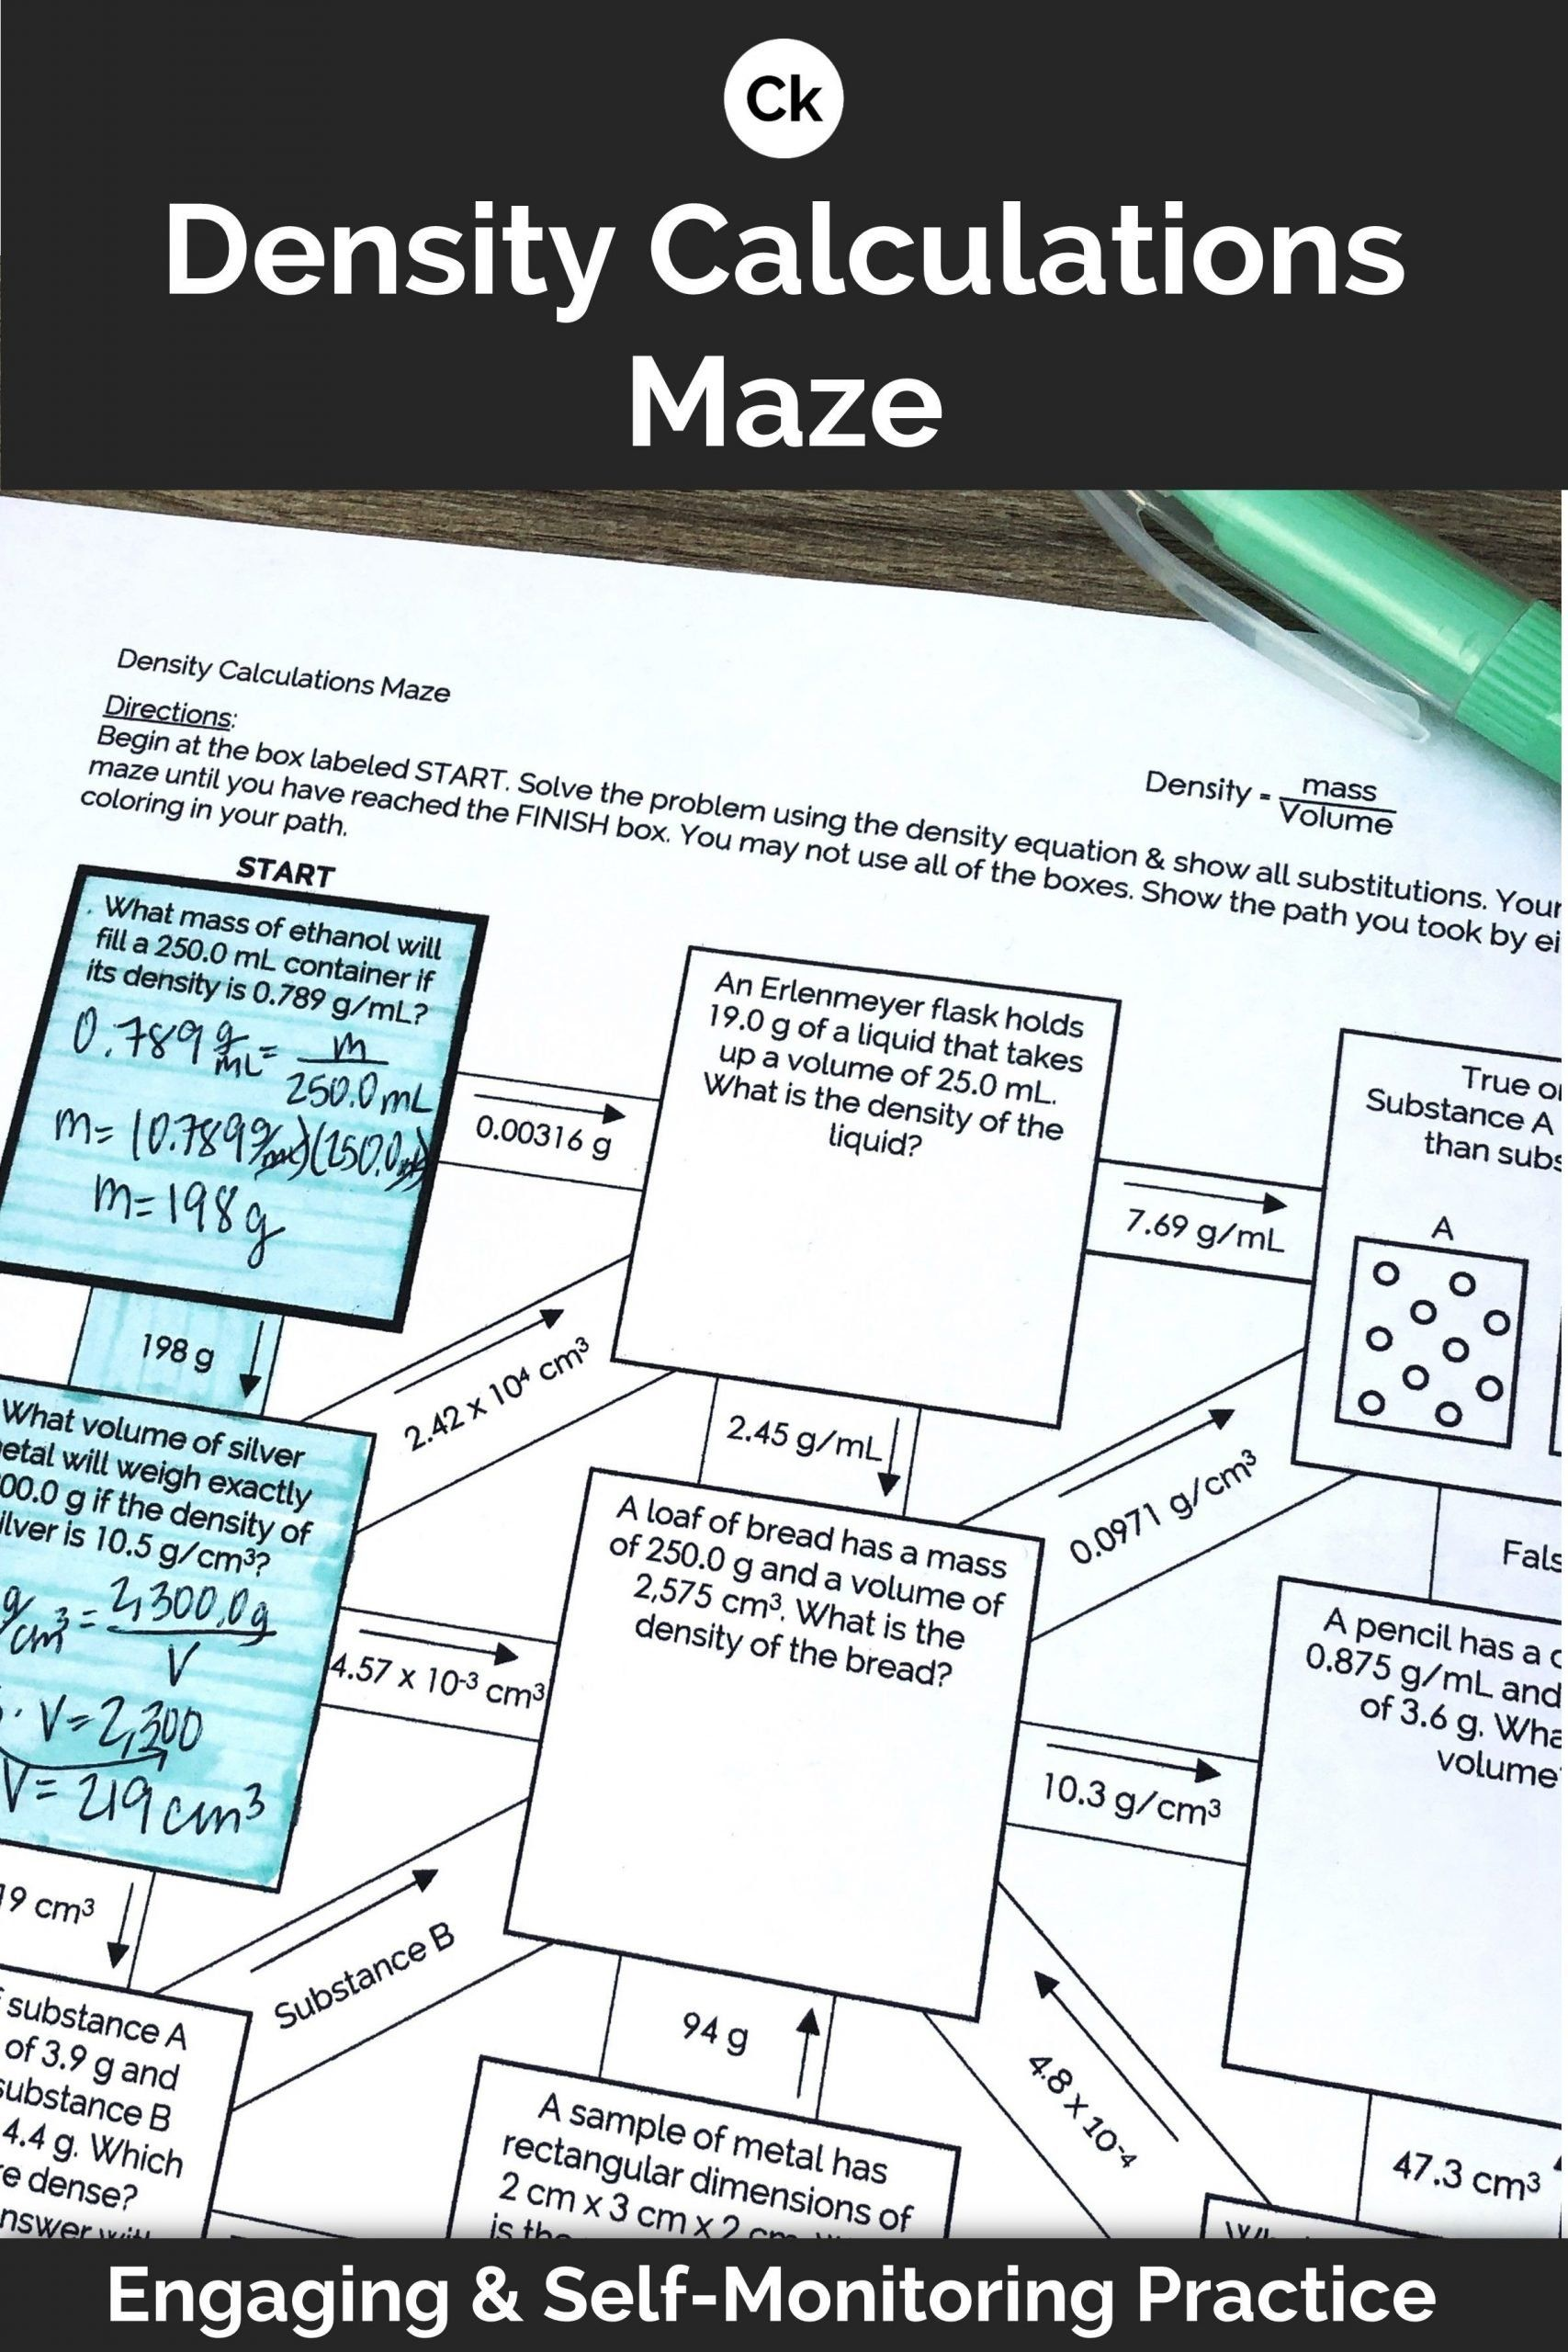 Density Calculations Worksheet Answer Key Density Mazes